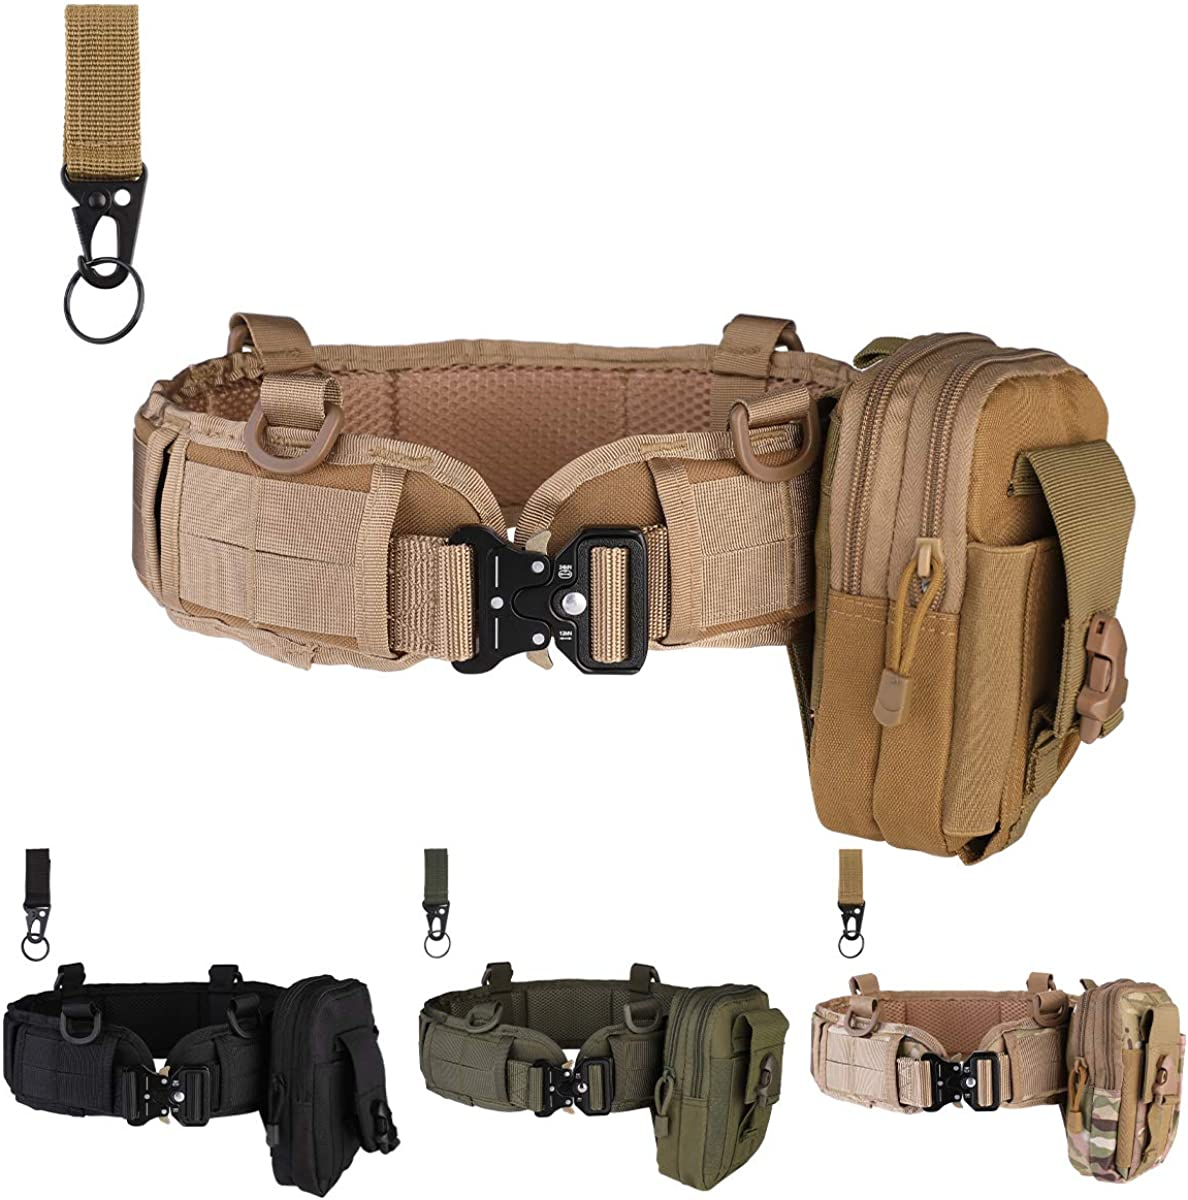 Fort Worth Mall Tactical Industry No. 1 Battle Belt Set Molle war belt tactical shooting